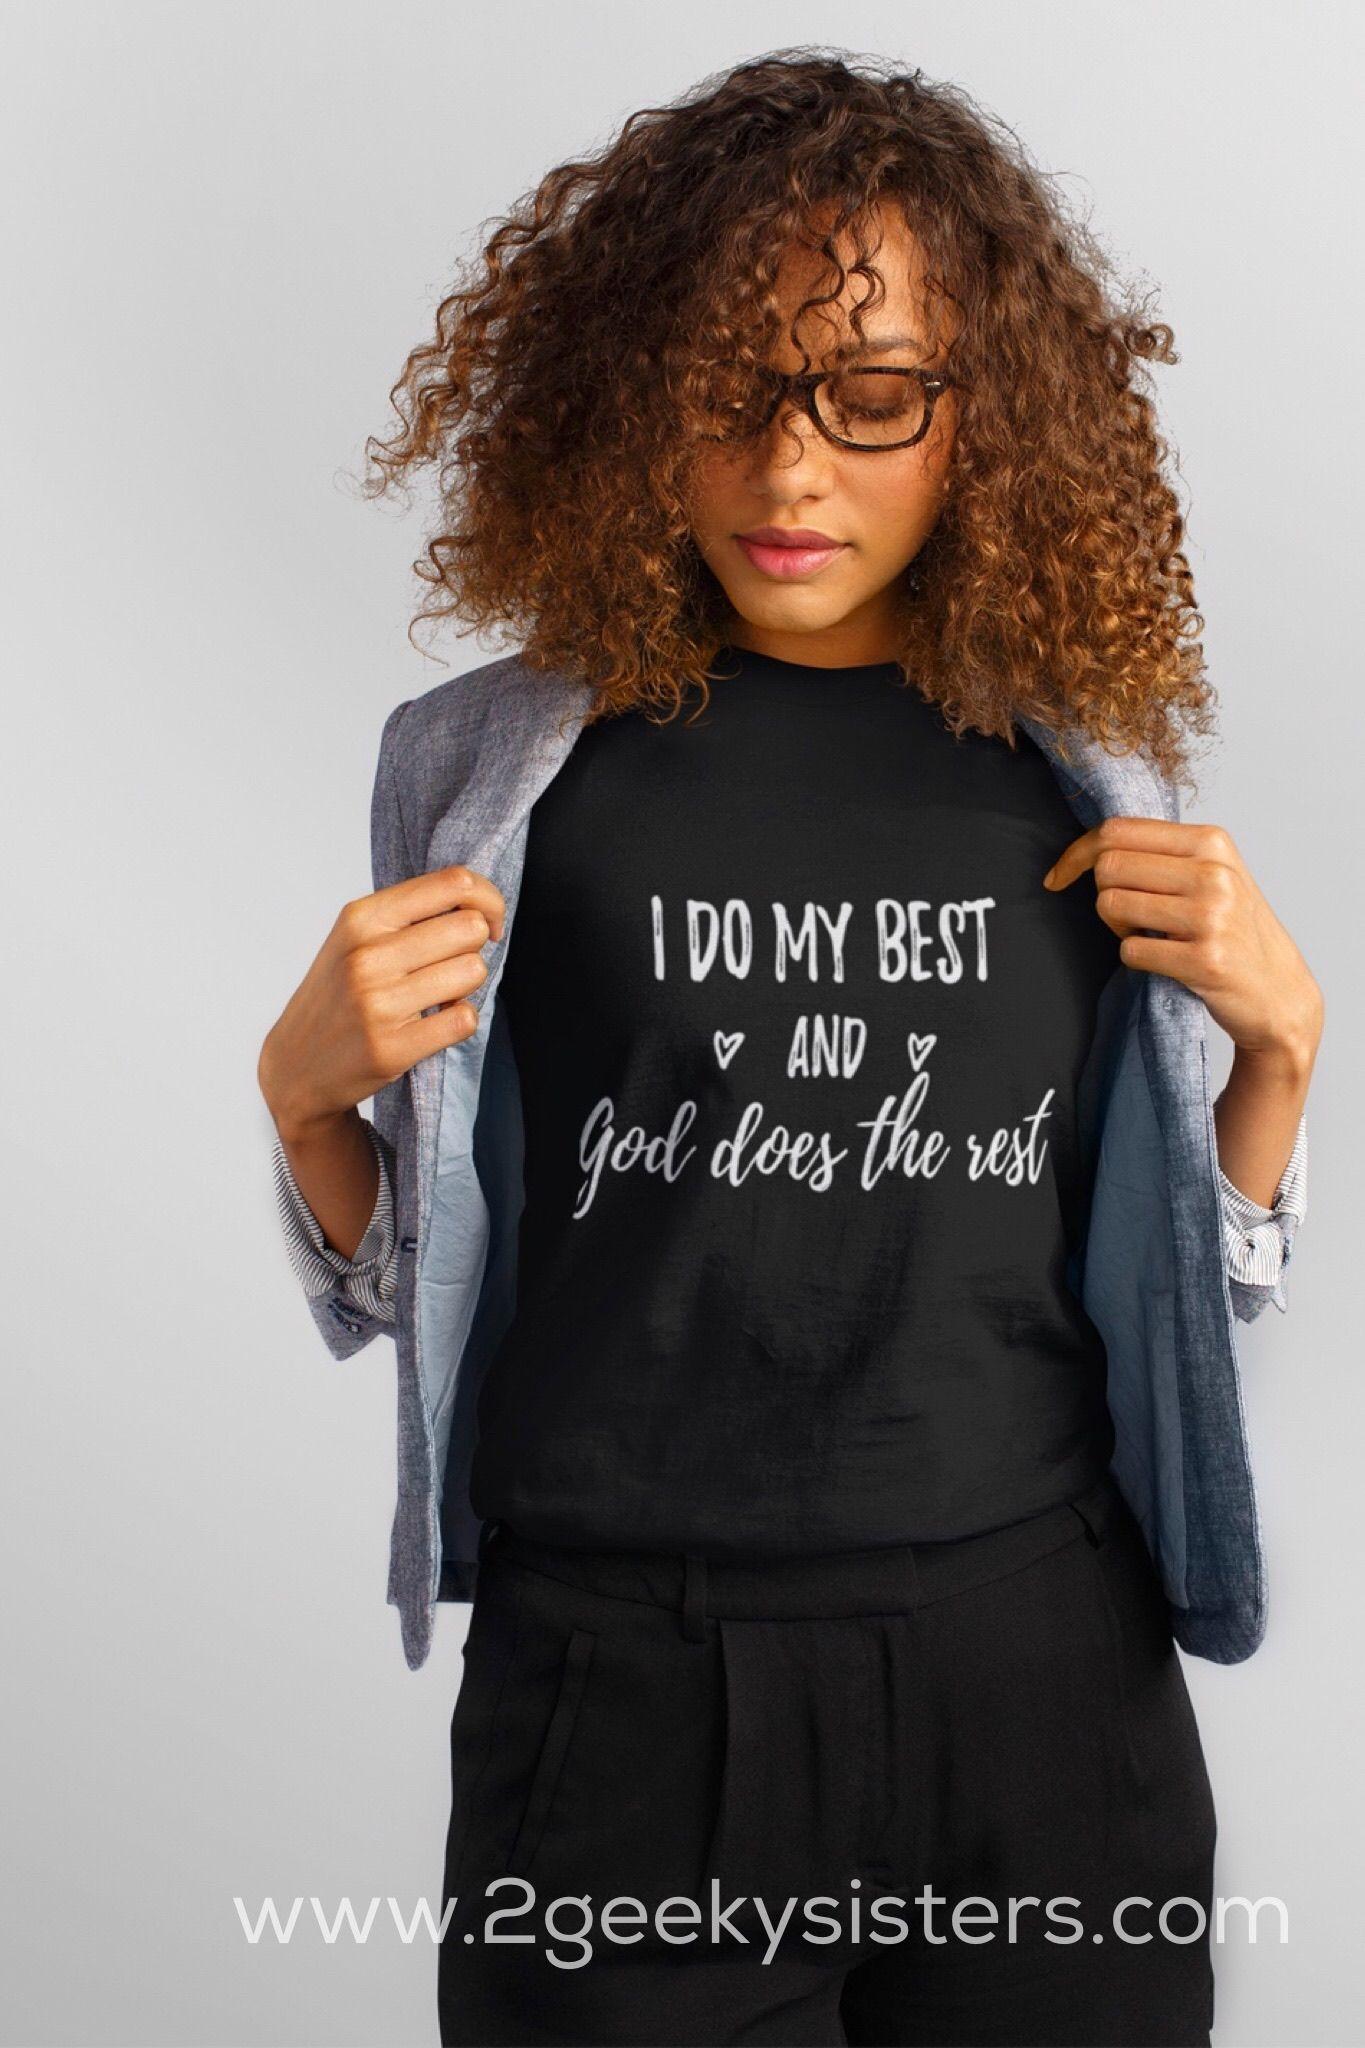 Christian Clothing Tees Shirts T Heart Printed Circuit Board Tshirts Unisex Triblend Tshirt Faith Encouragement Scriptures Prayer